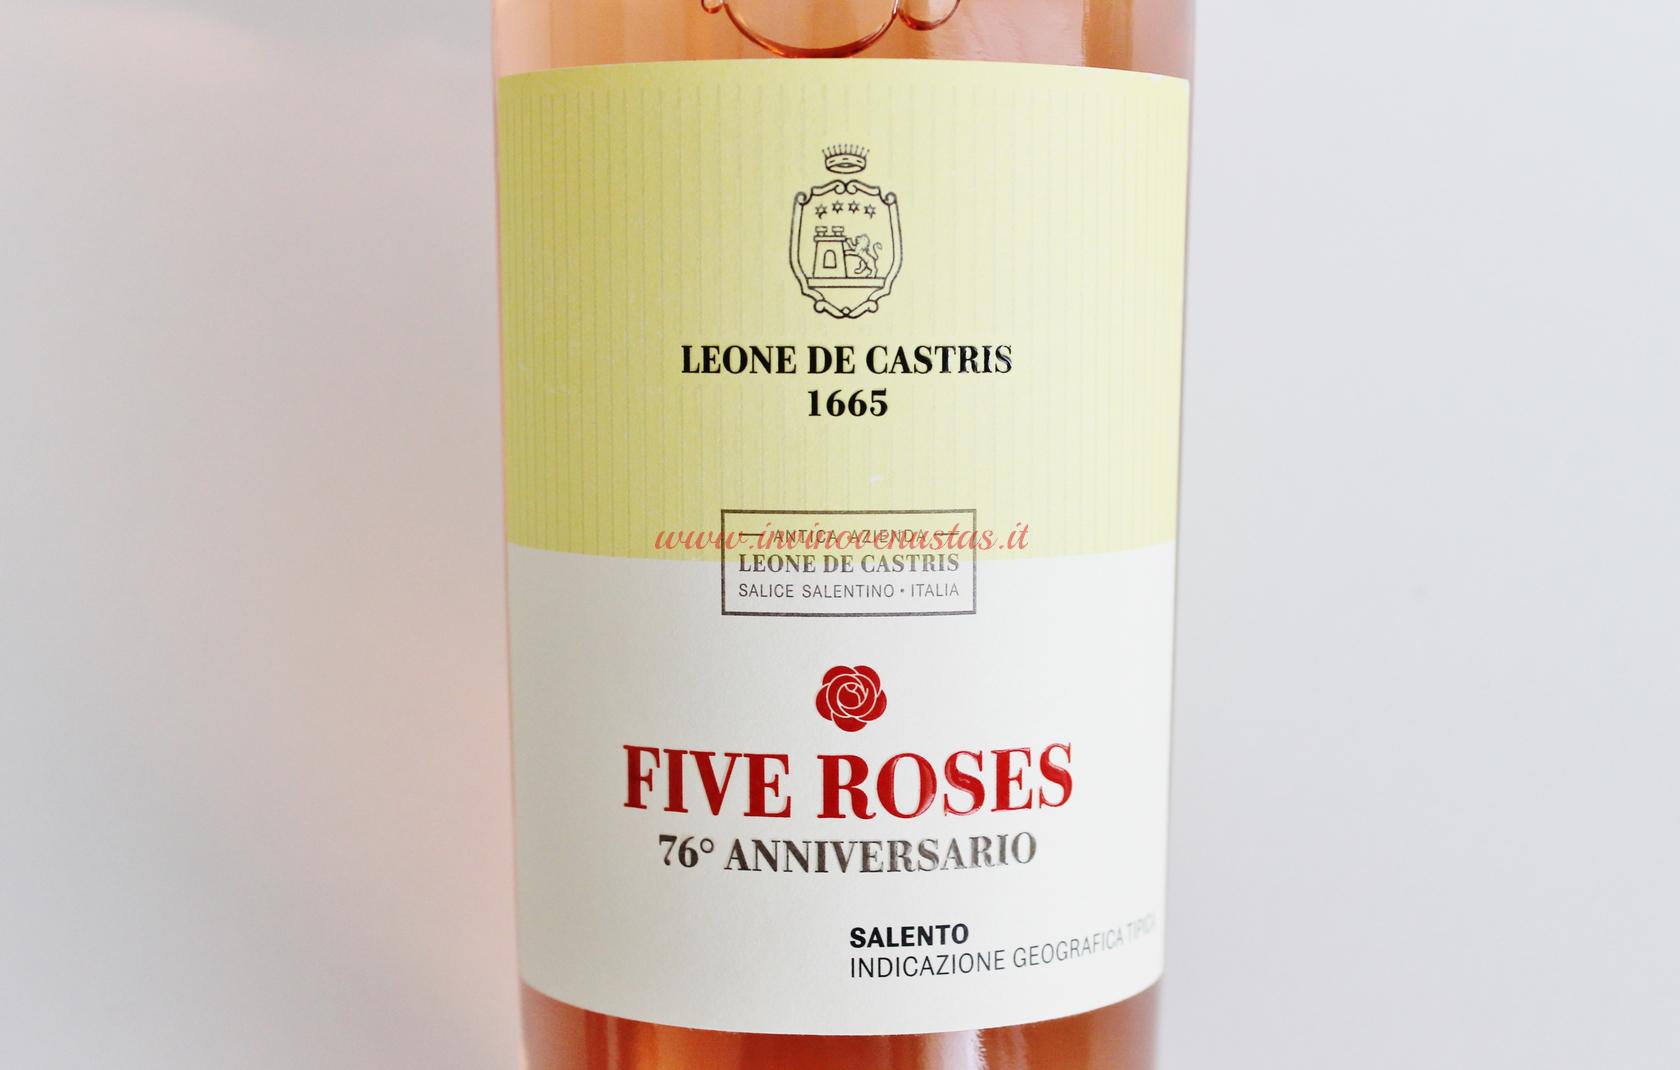 Five Roses 76esimo Anniversario Leone De Castris